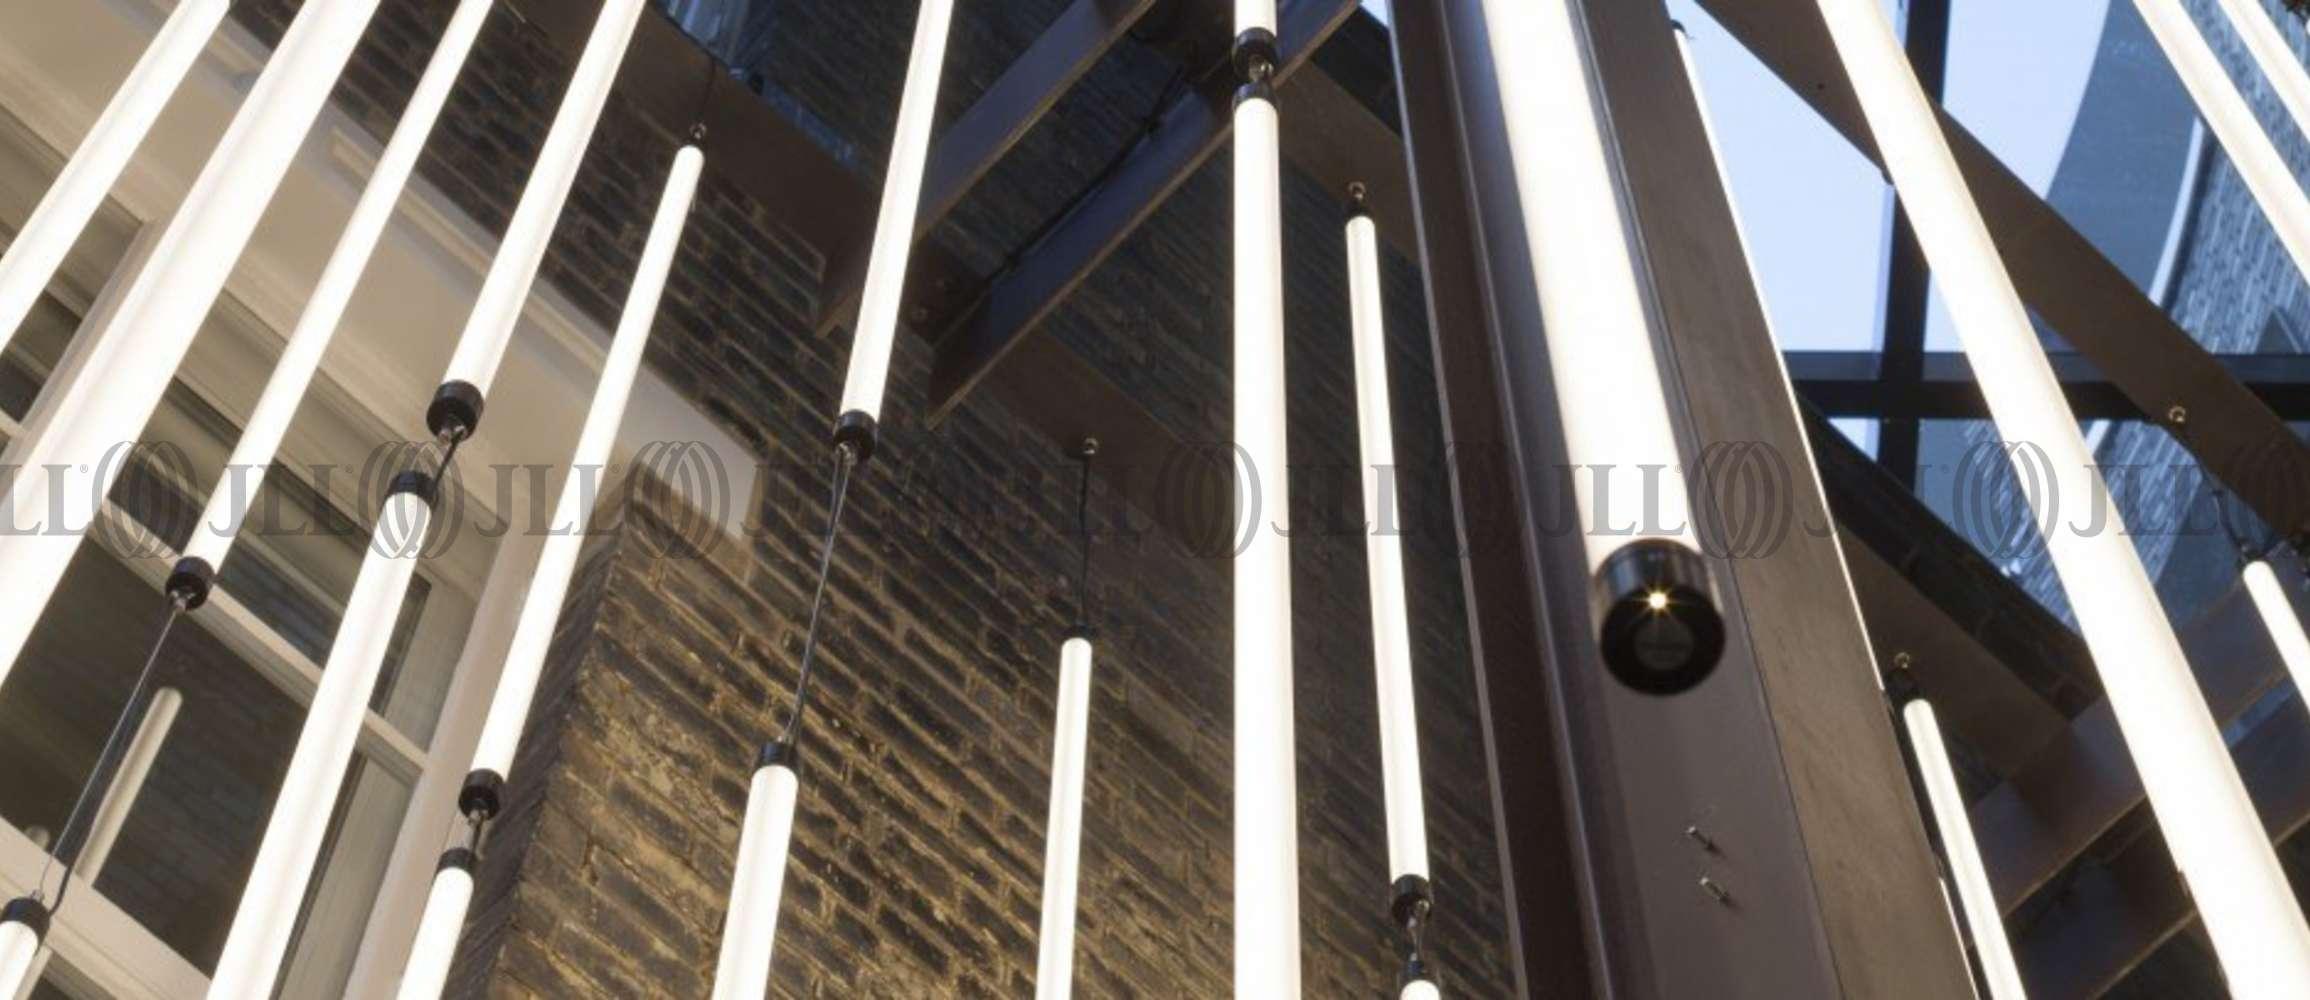 Serviced office London, N1C 4AG - The Stanley Building, Kings Cross